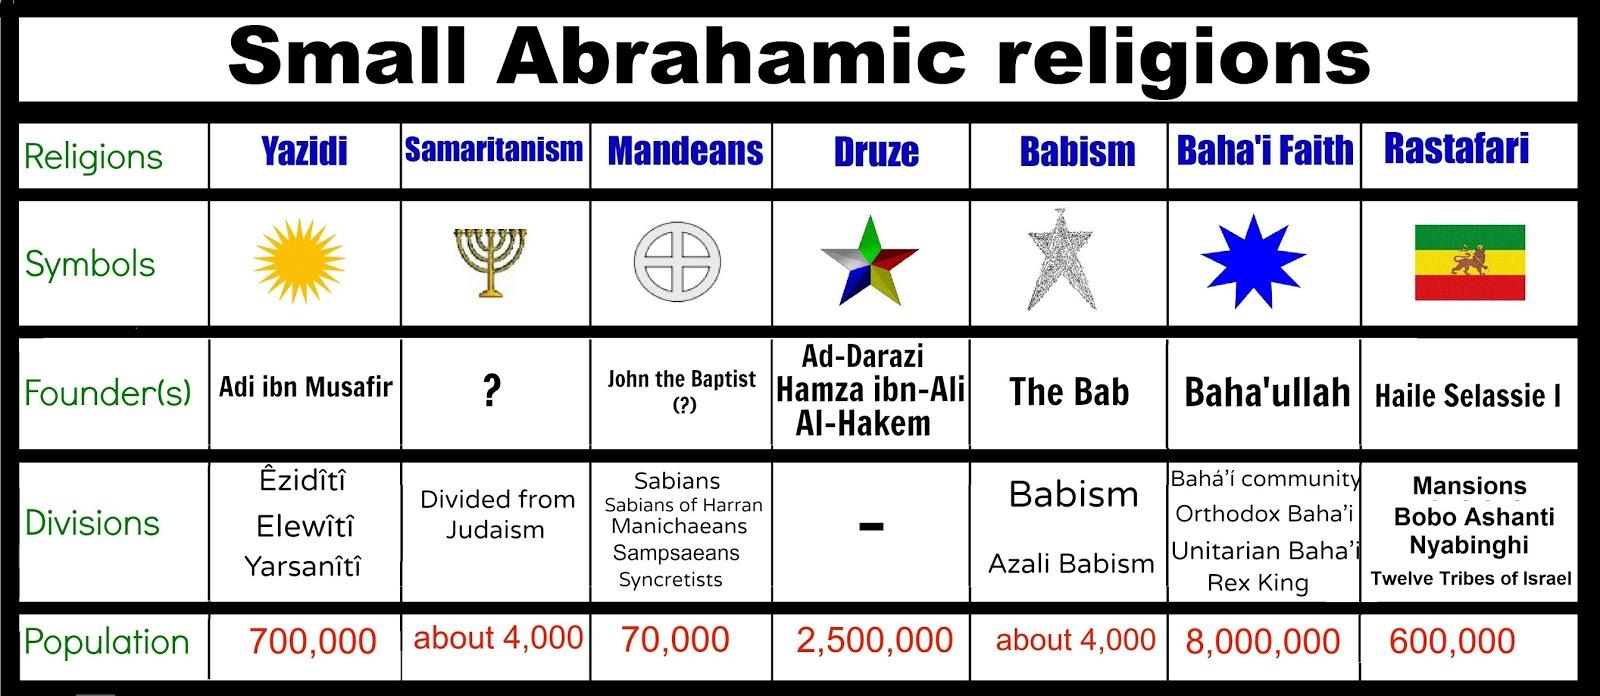 Http freeglobaluniversityspot search label angels also freeglobaluniversity abrahamic religions rh